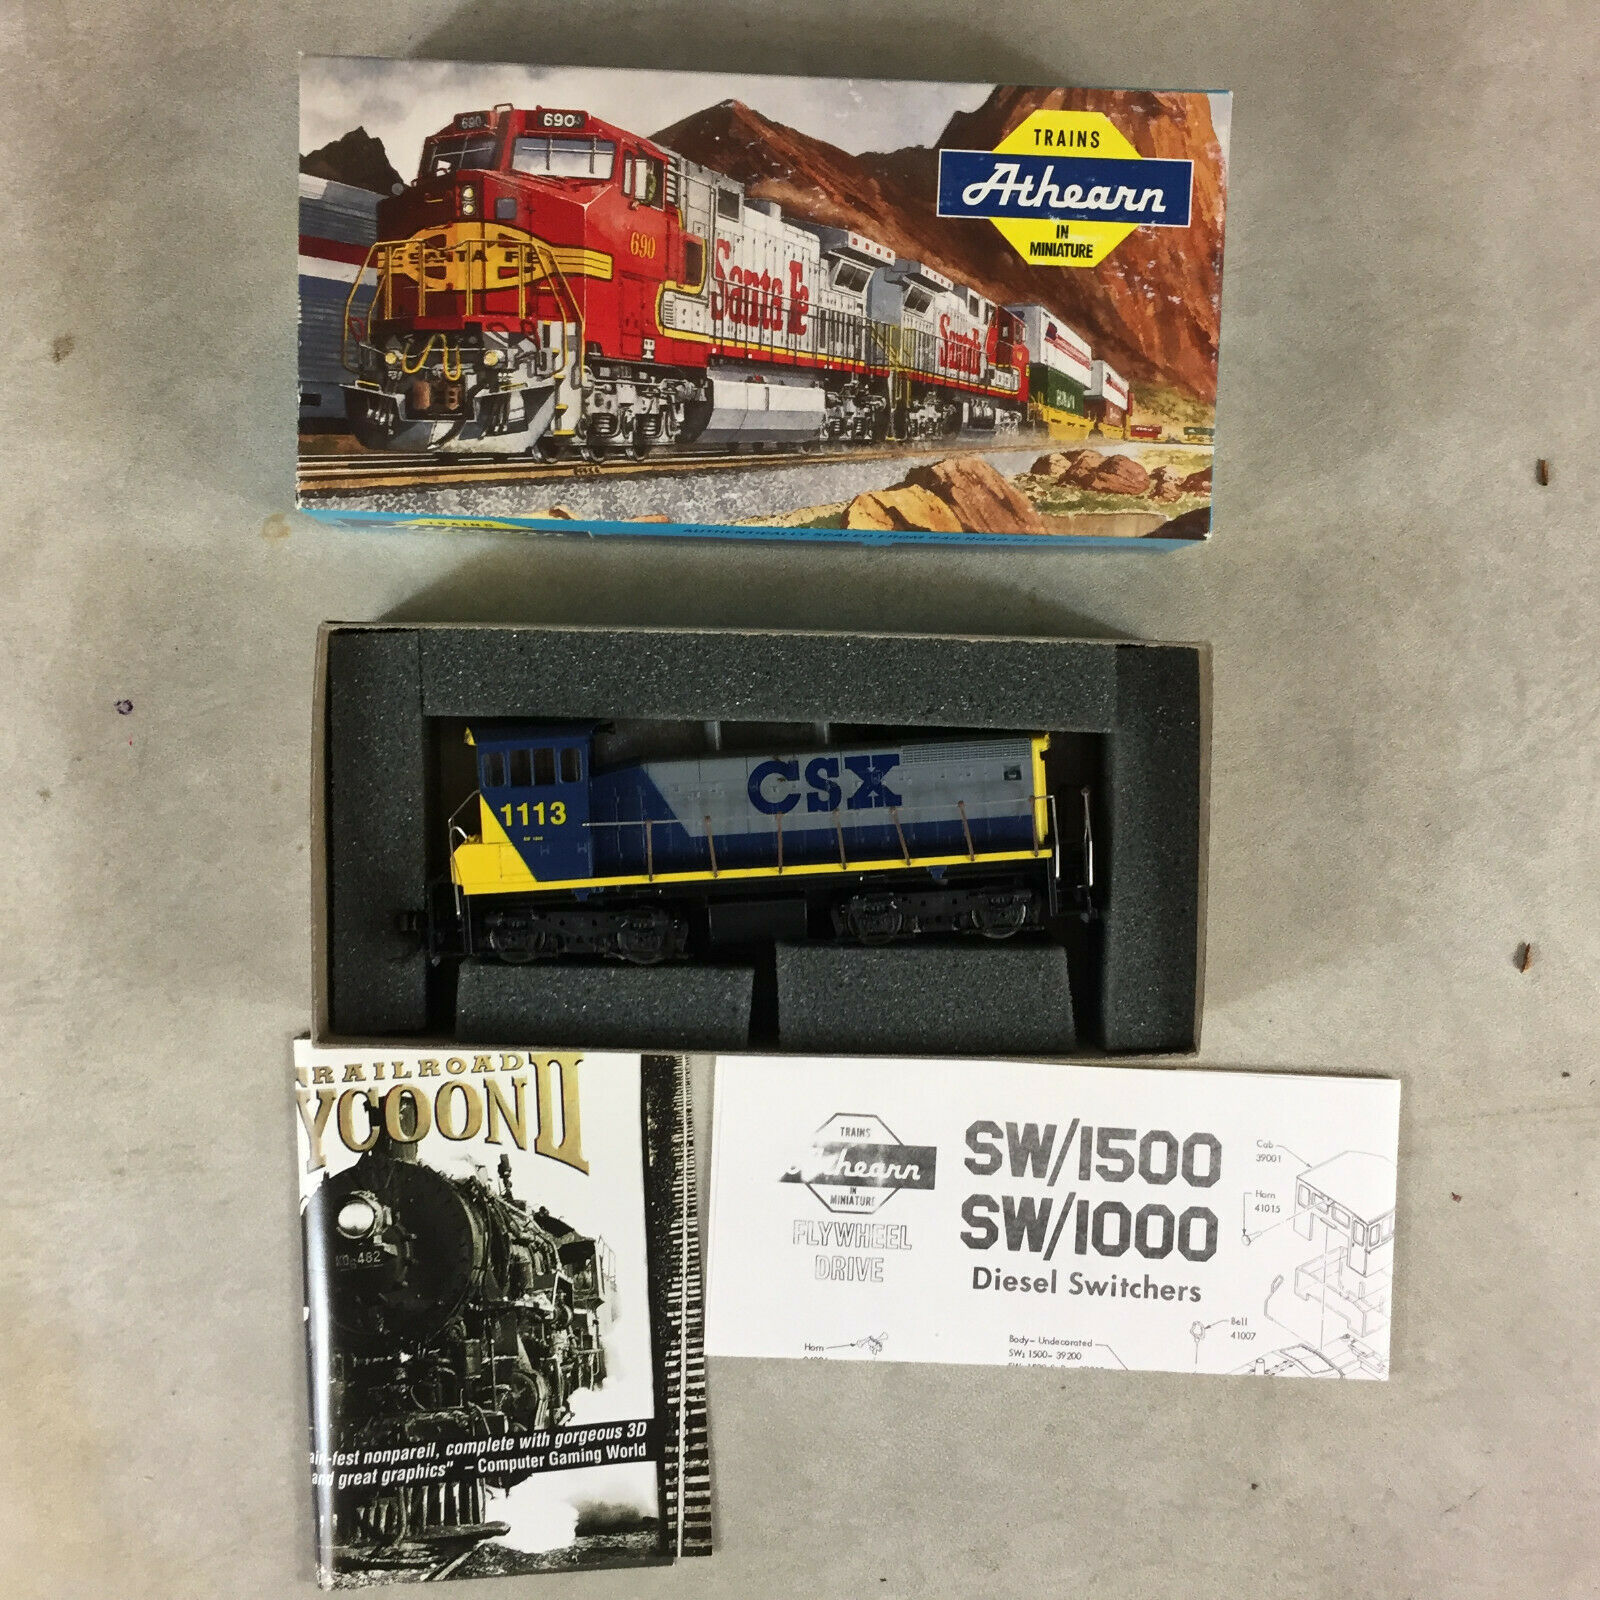 Medidor de HO ATHEARN CSX Vintage Motor De Locomotora De Tren FerroCocheril Modelo Con Caja